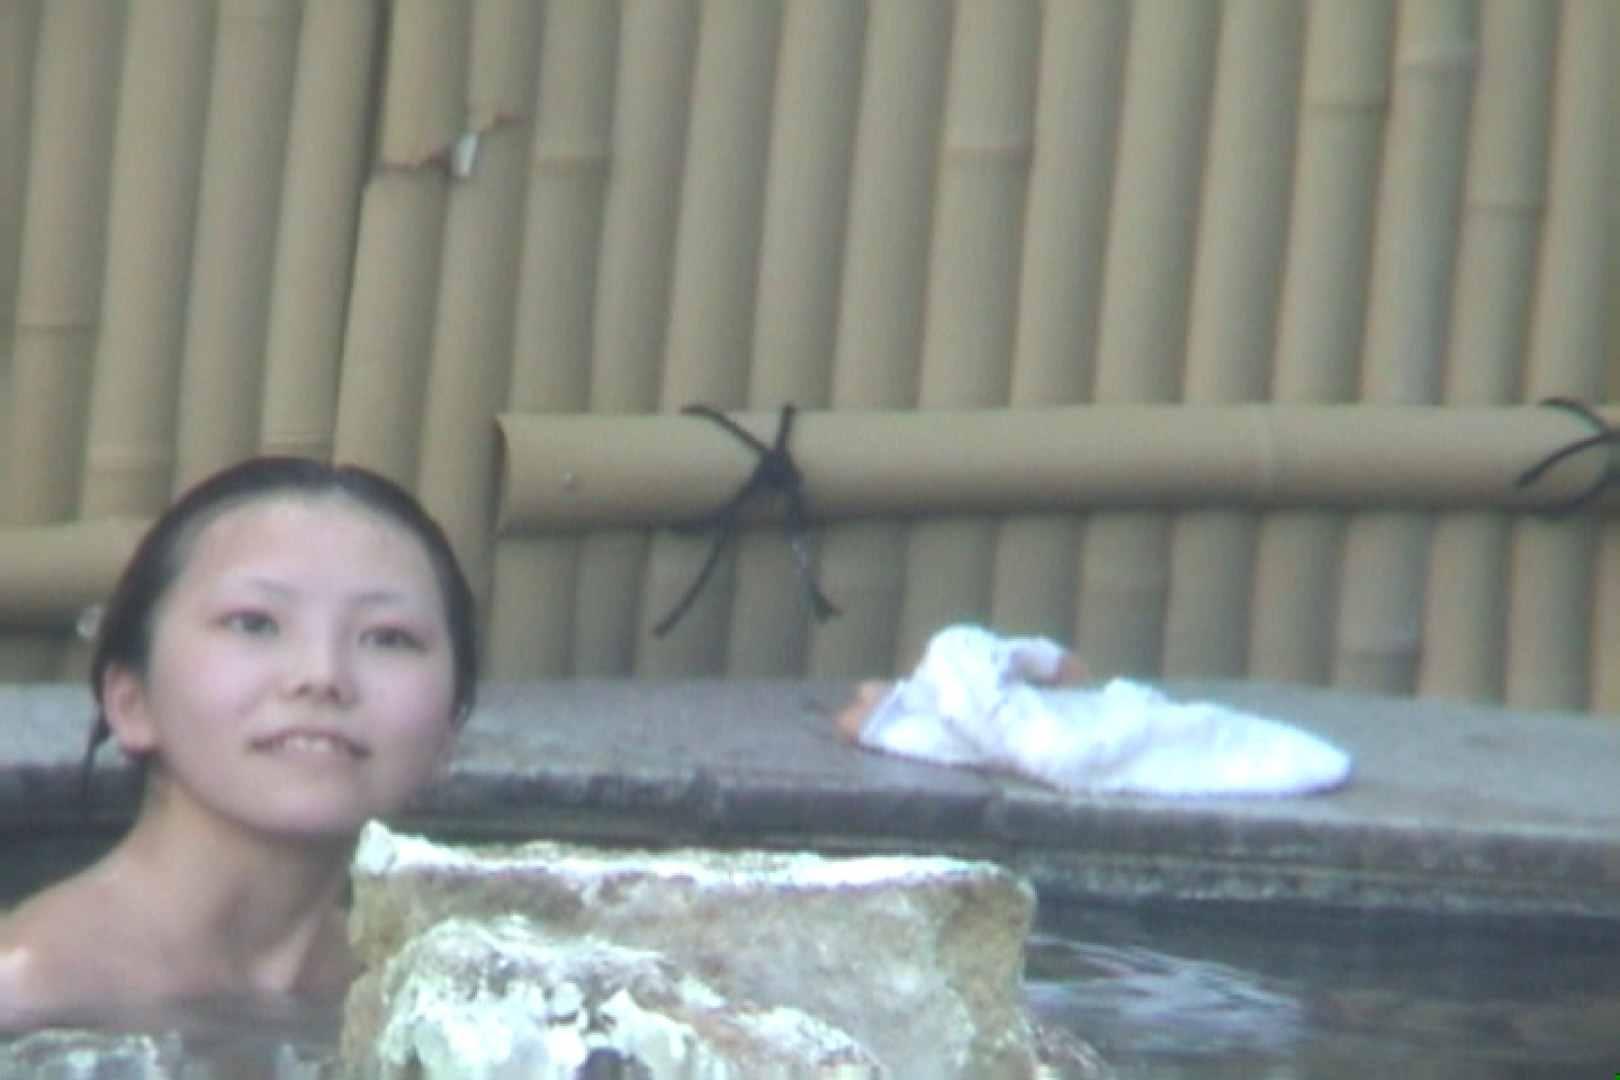 Aquaな露天風呂Vol.572 盗撮 | OLエロ画像  67PICs 61